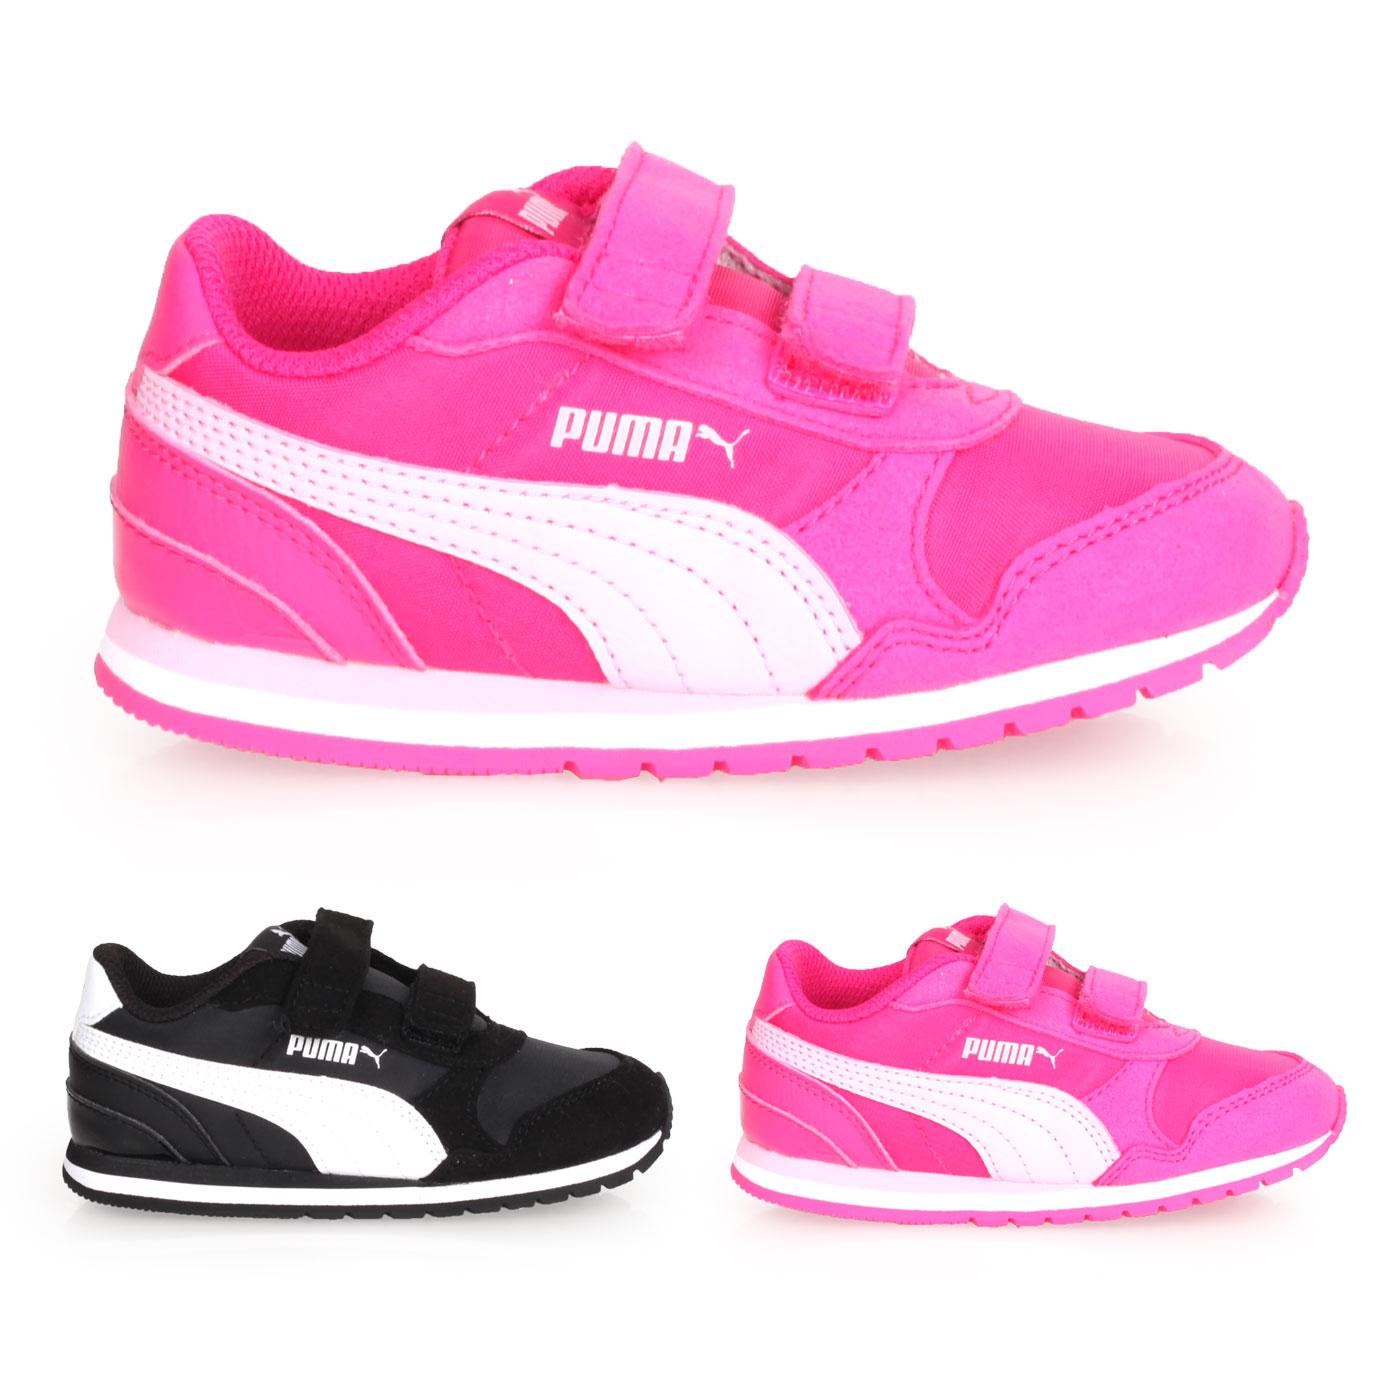 PUMA 小童復古慢跑鞋  @ST Runner v2 NL V  Inf@36529501